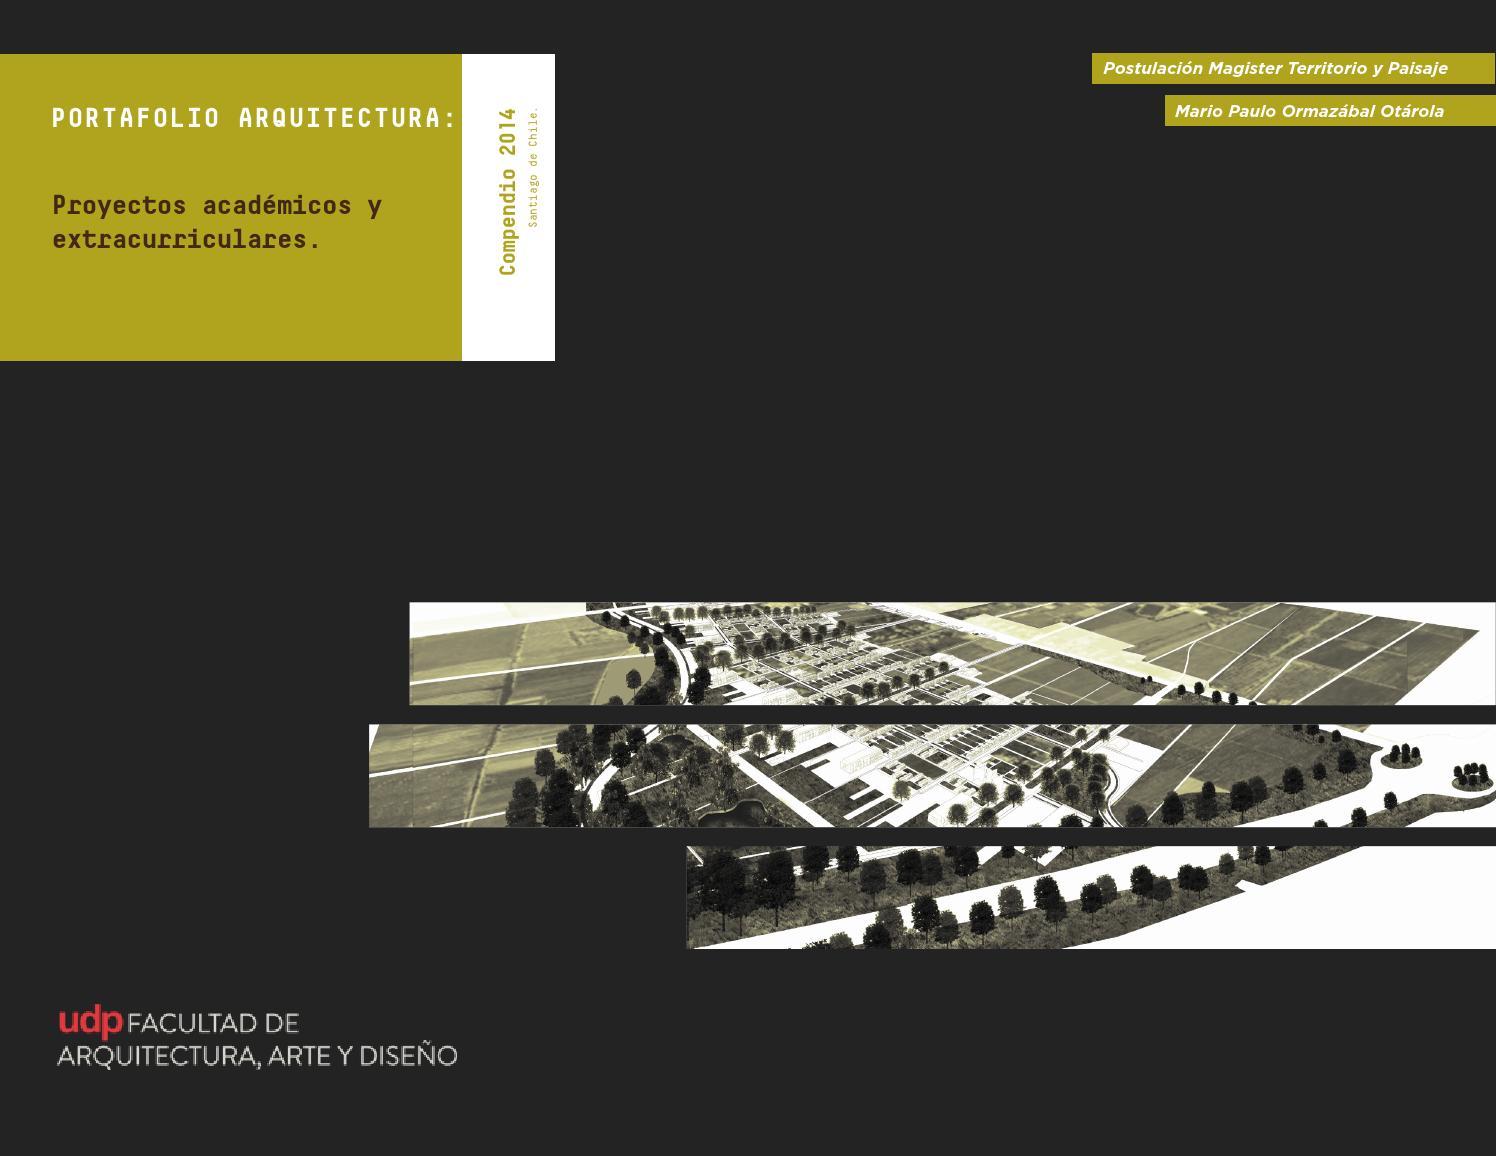 Mario Ormaz Bal O Portafolio Arquitectura Udp Compendio